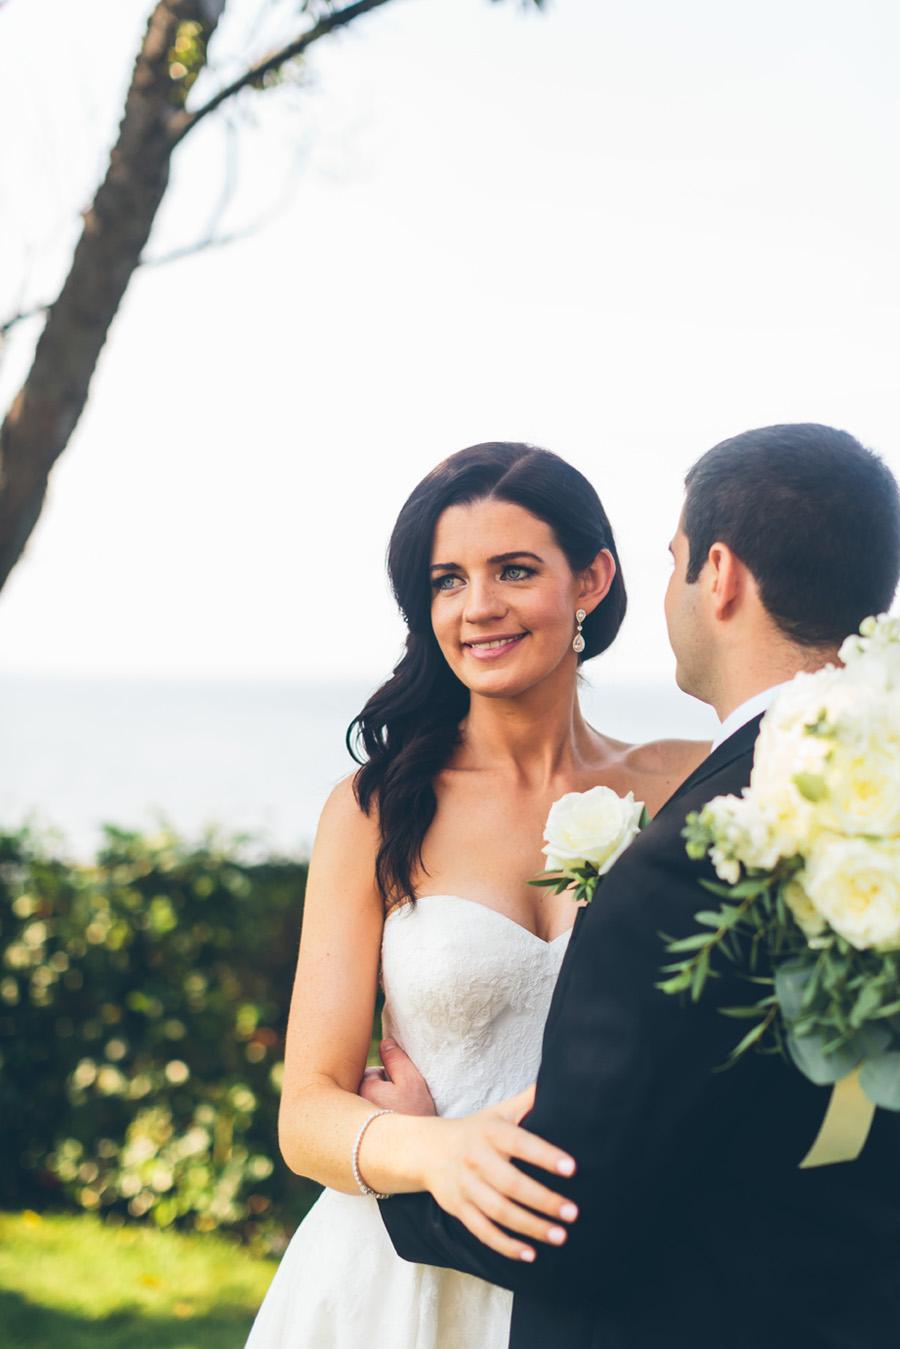 VICTORIA-BRIAN-NY-WEDDING-BRIDEGROOM-CYNTHIACHUNG-0097.jpg